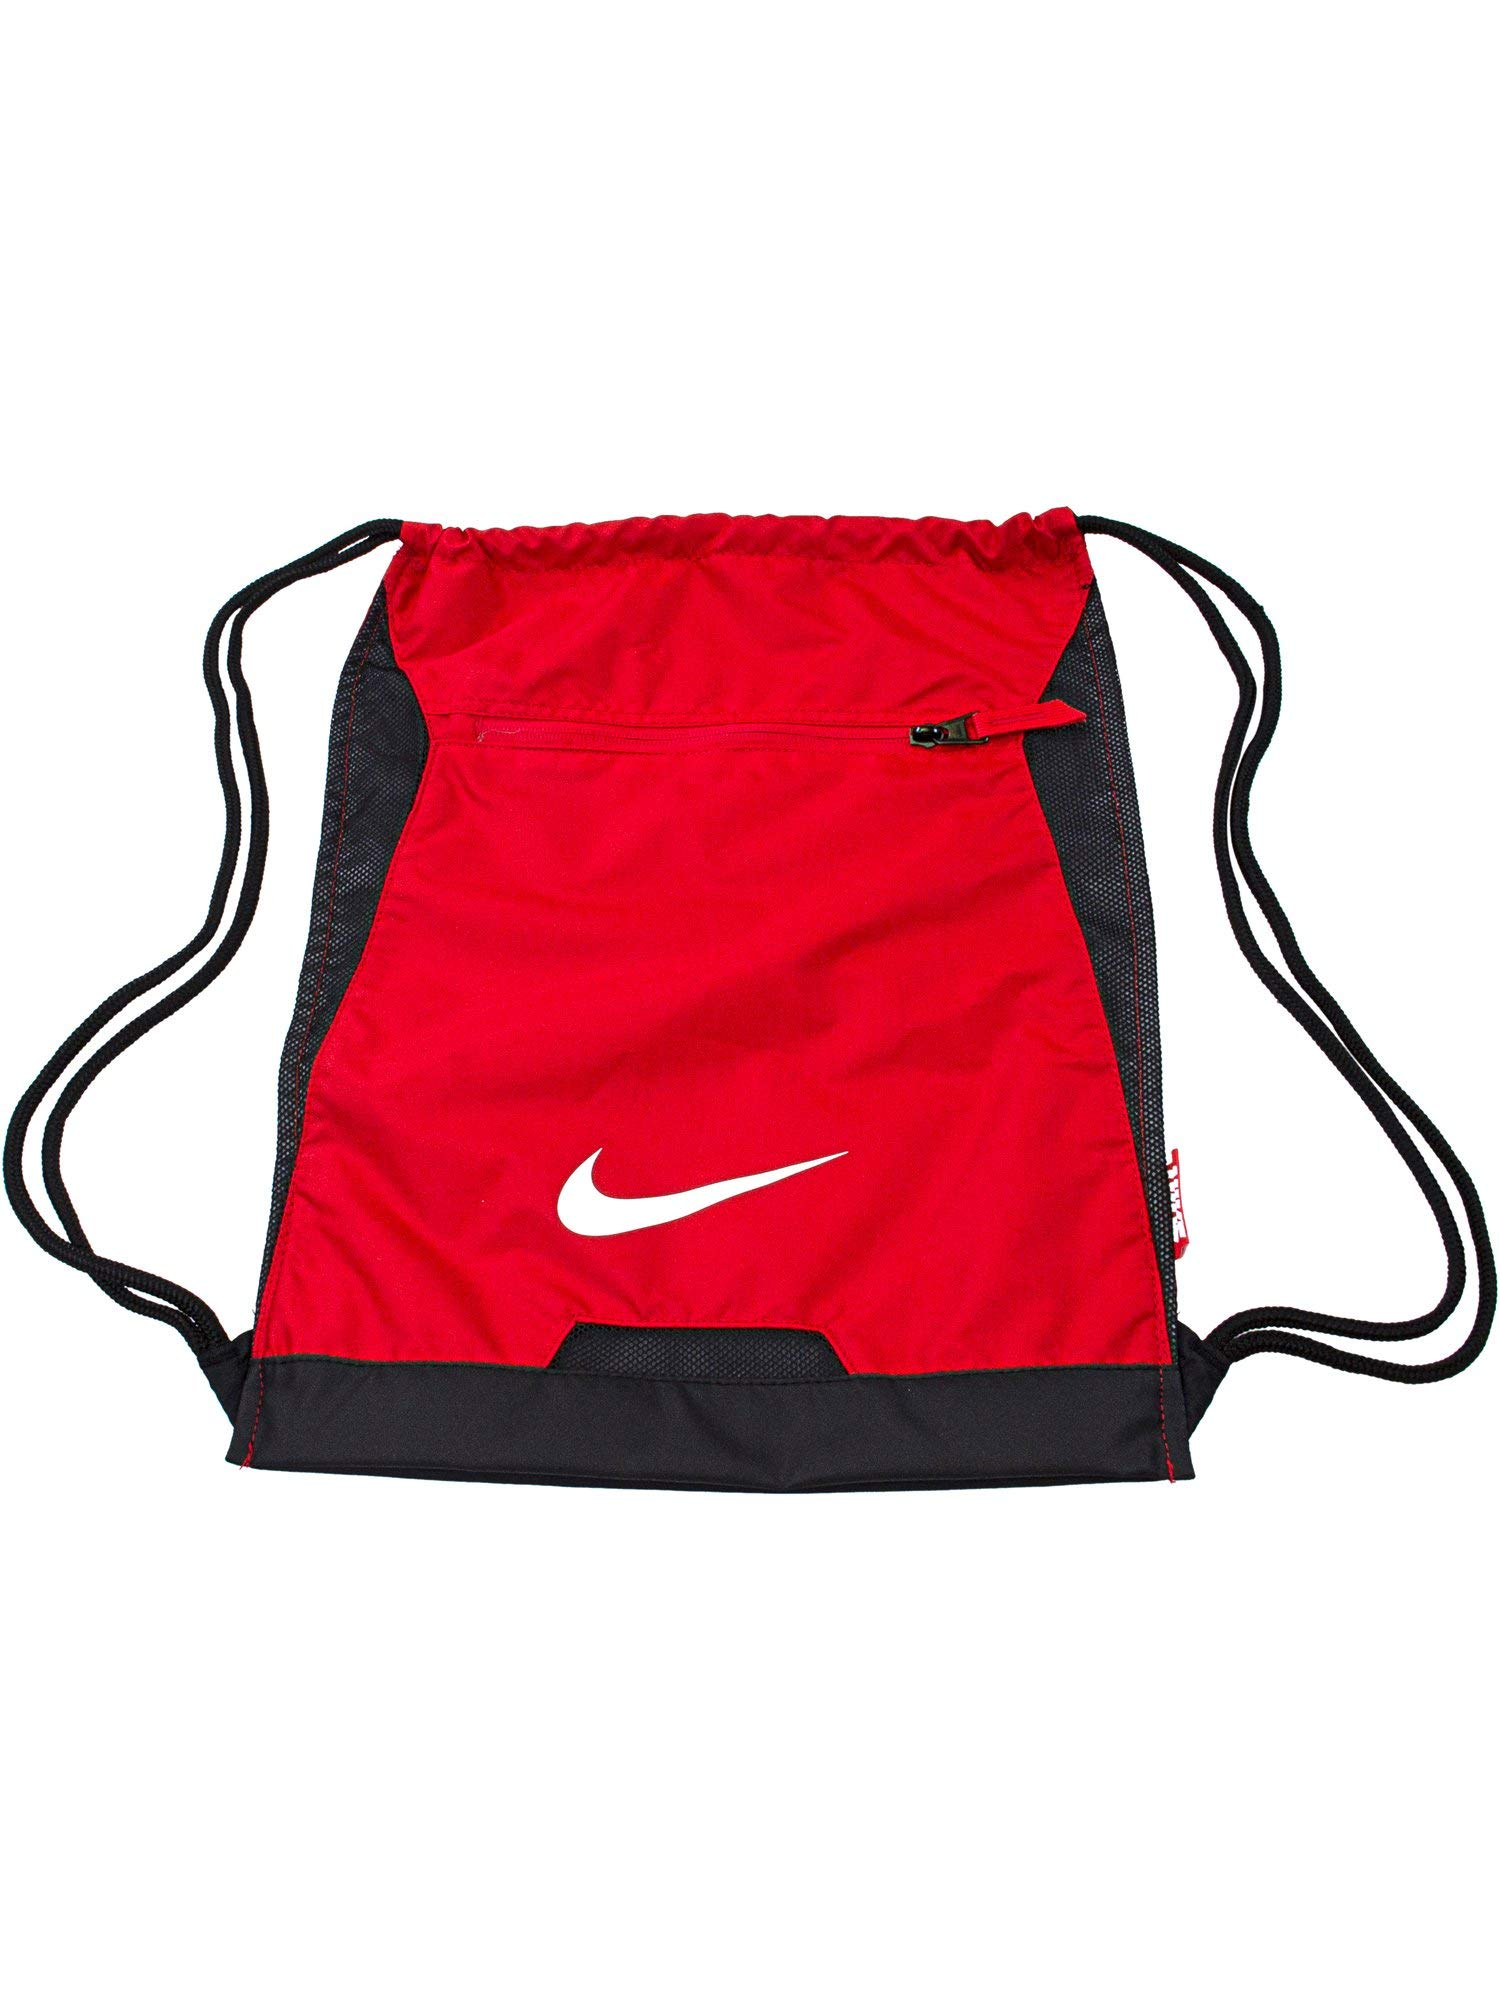 Nike Men's Alpha Gym Sack (University RED/Black/White)